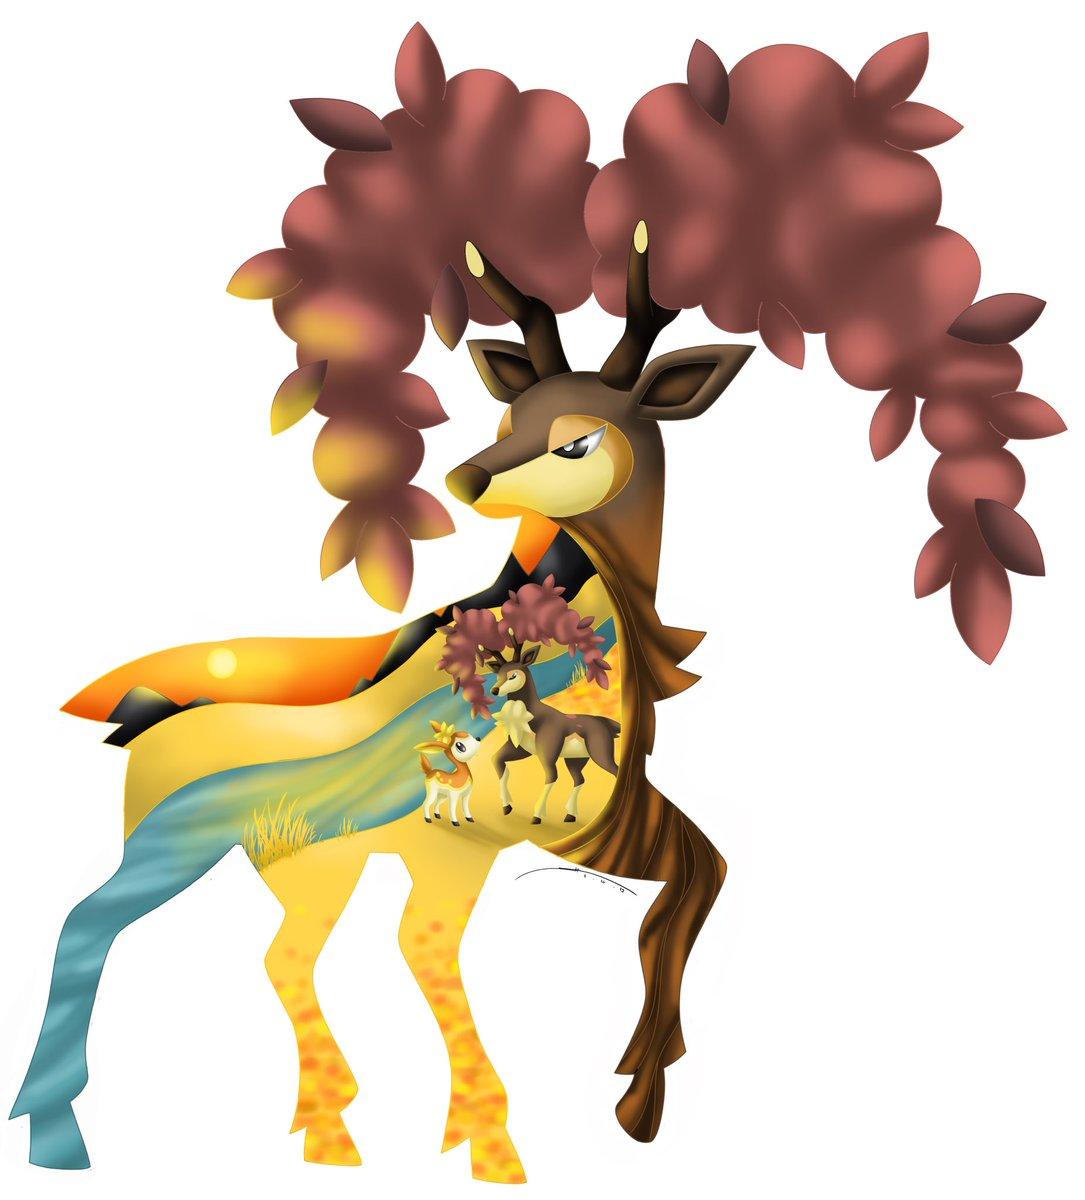 Fall Sunset 🌅  I'm trying a new style ^^ And since it's fall, the Autumn form of Sawsbuck is a perfect start. Plus, I like Sawsbuck ^^  What do u think?   https://darkrailady.deviantart.com/  #pokemon #pokemonfanart #sawsbuck #autumn #fall